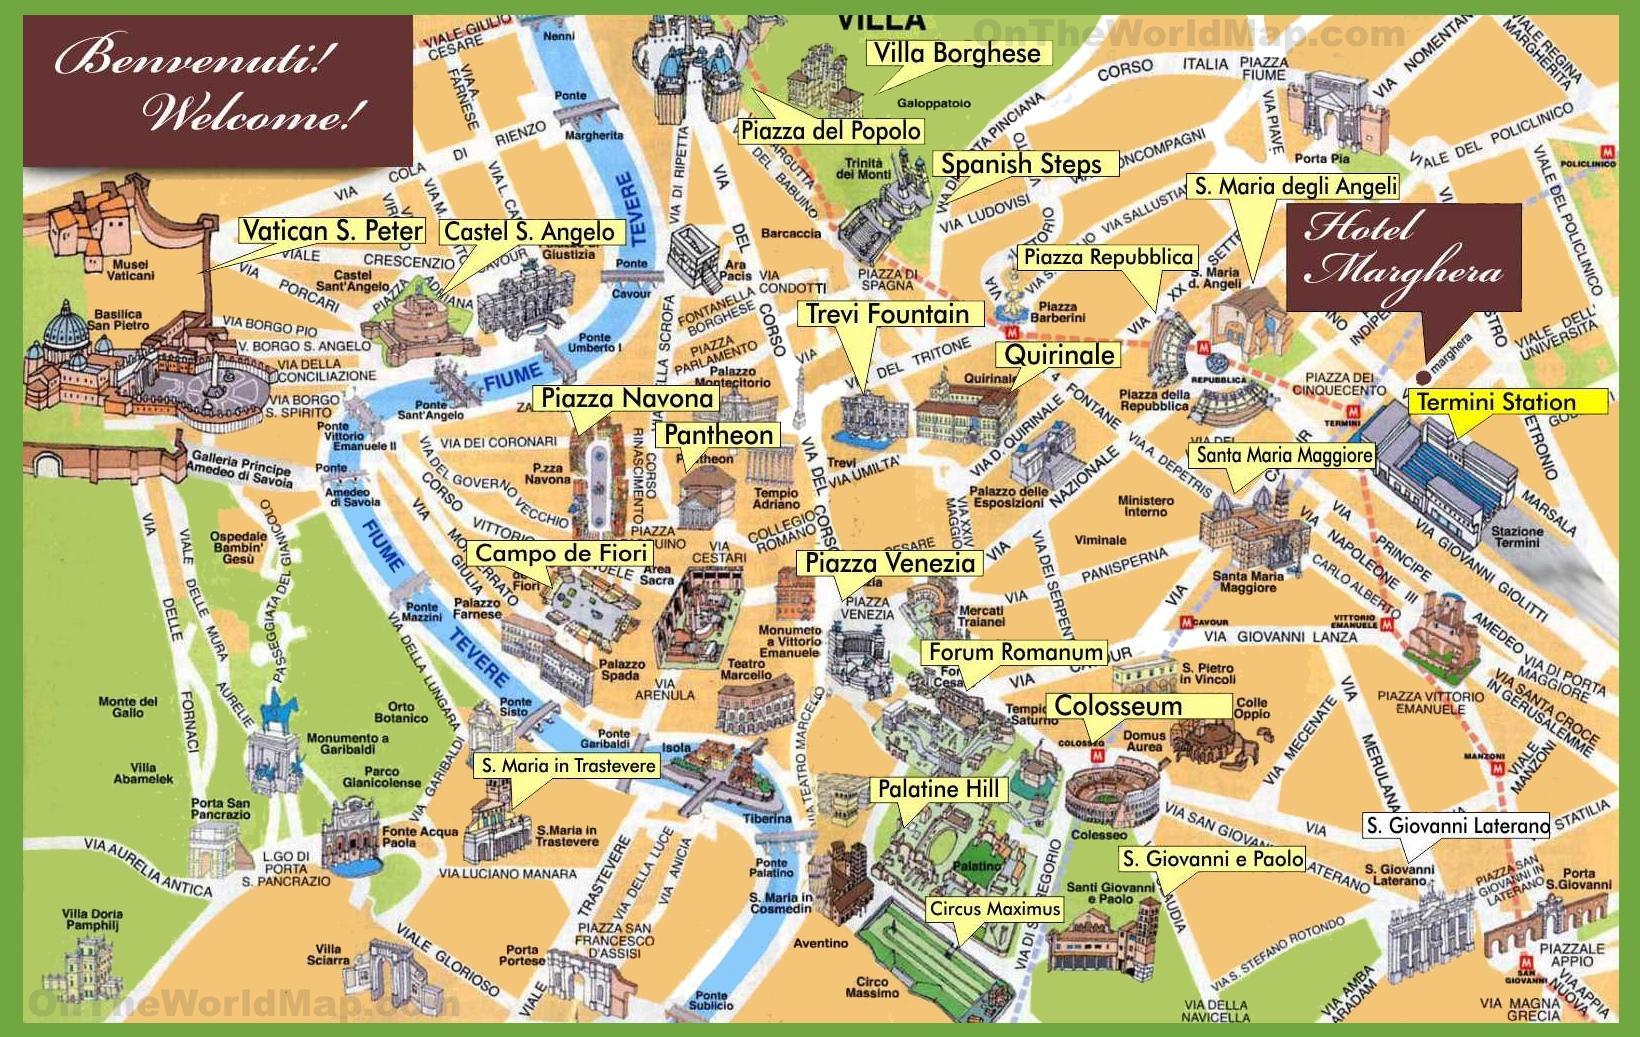 City Sightseeing I Rom Kort Kort Over Byen Sightseeing I Rom